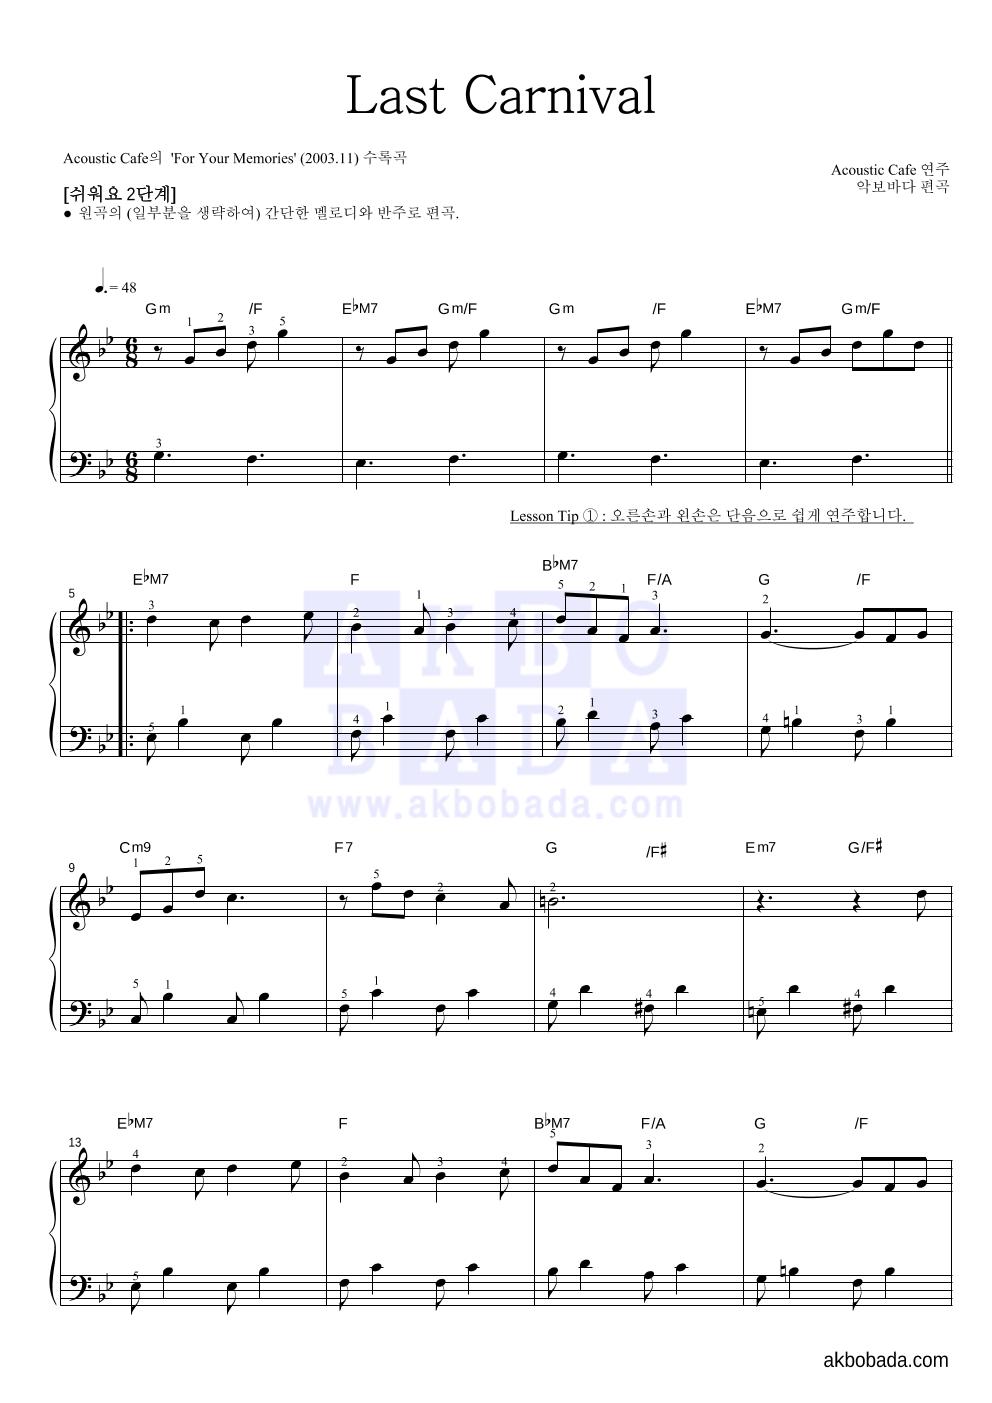 Acoustic Cafe - Last Carnival 피아노2단-쉬워요 악보